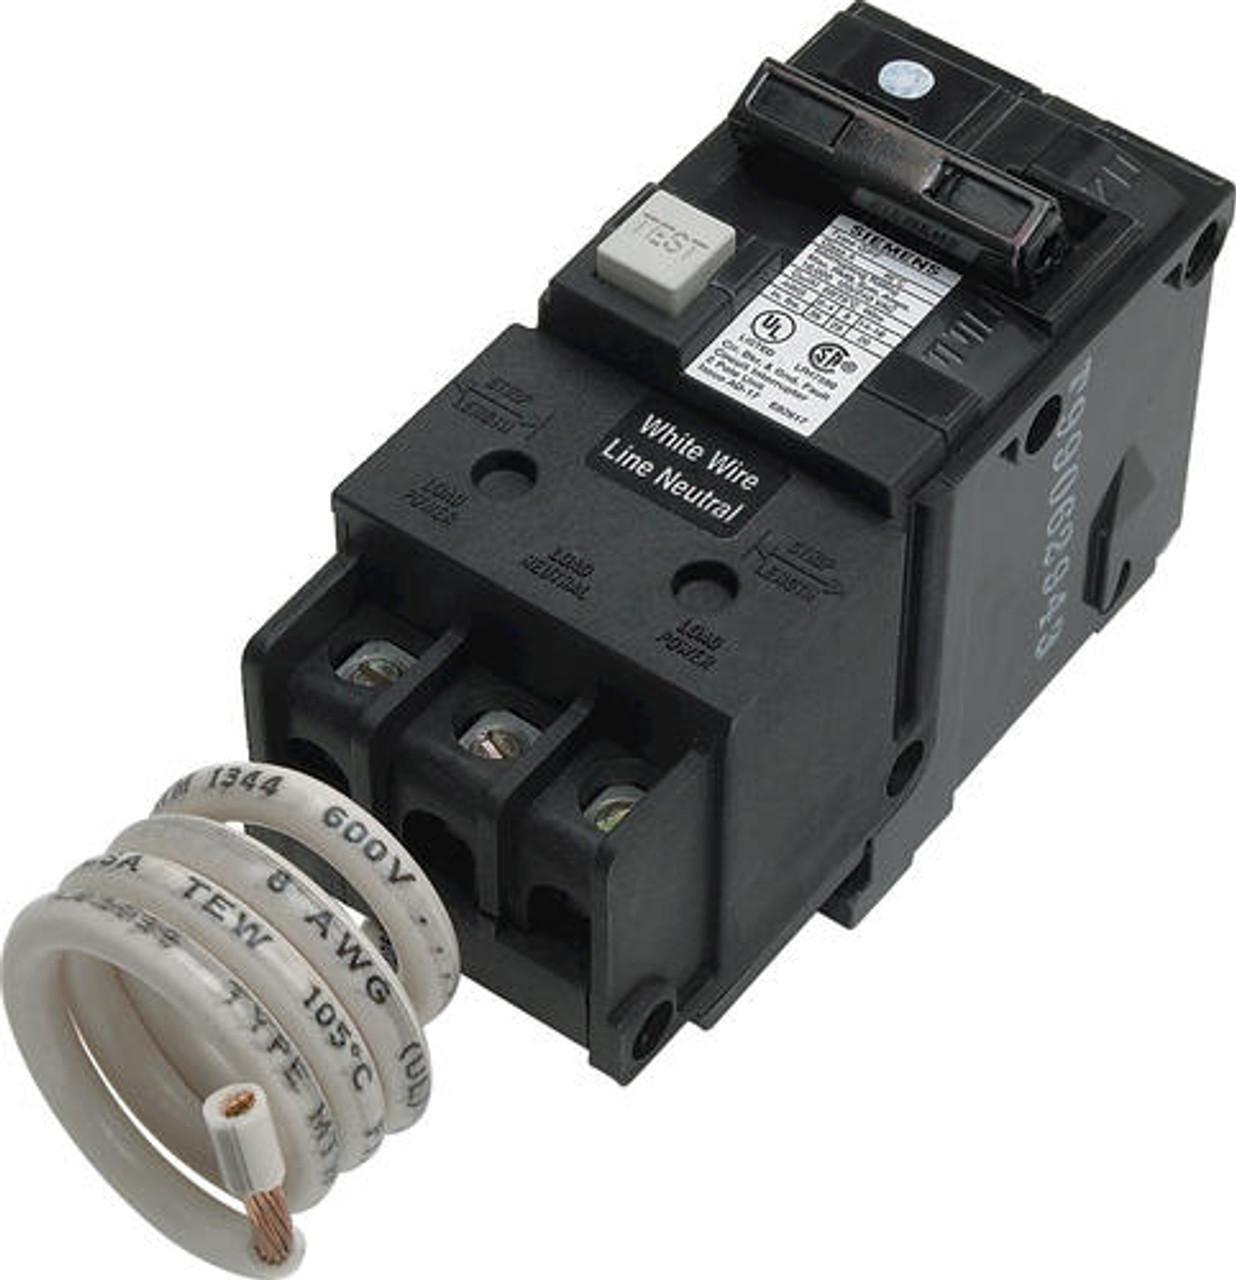 small resolution of siemens 40 amp gfci double pole breaker in canada siemens gfci breaker wiring